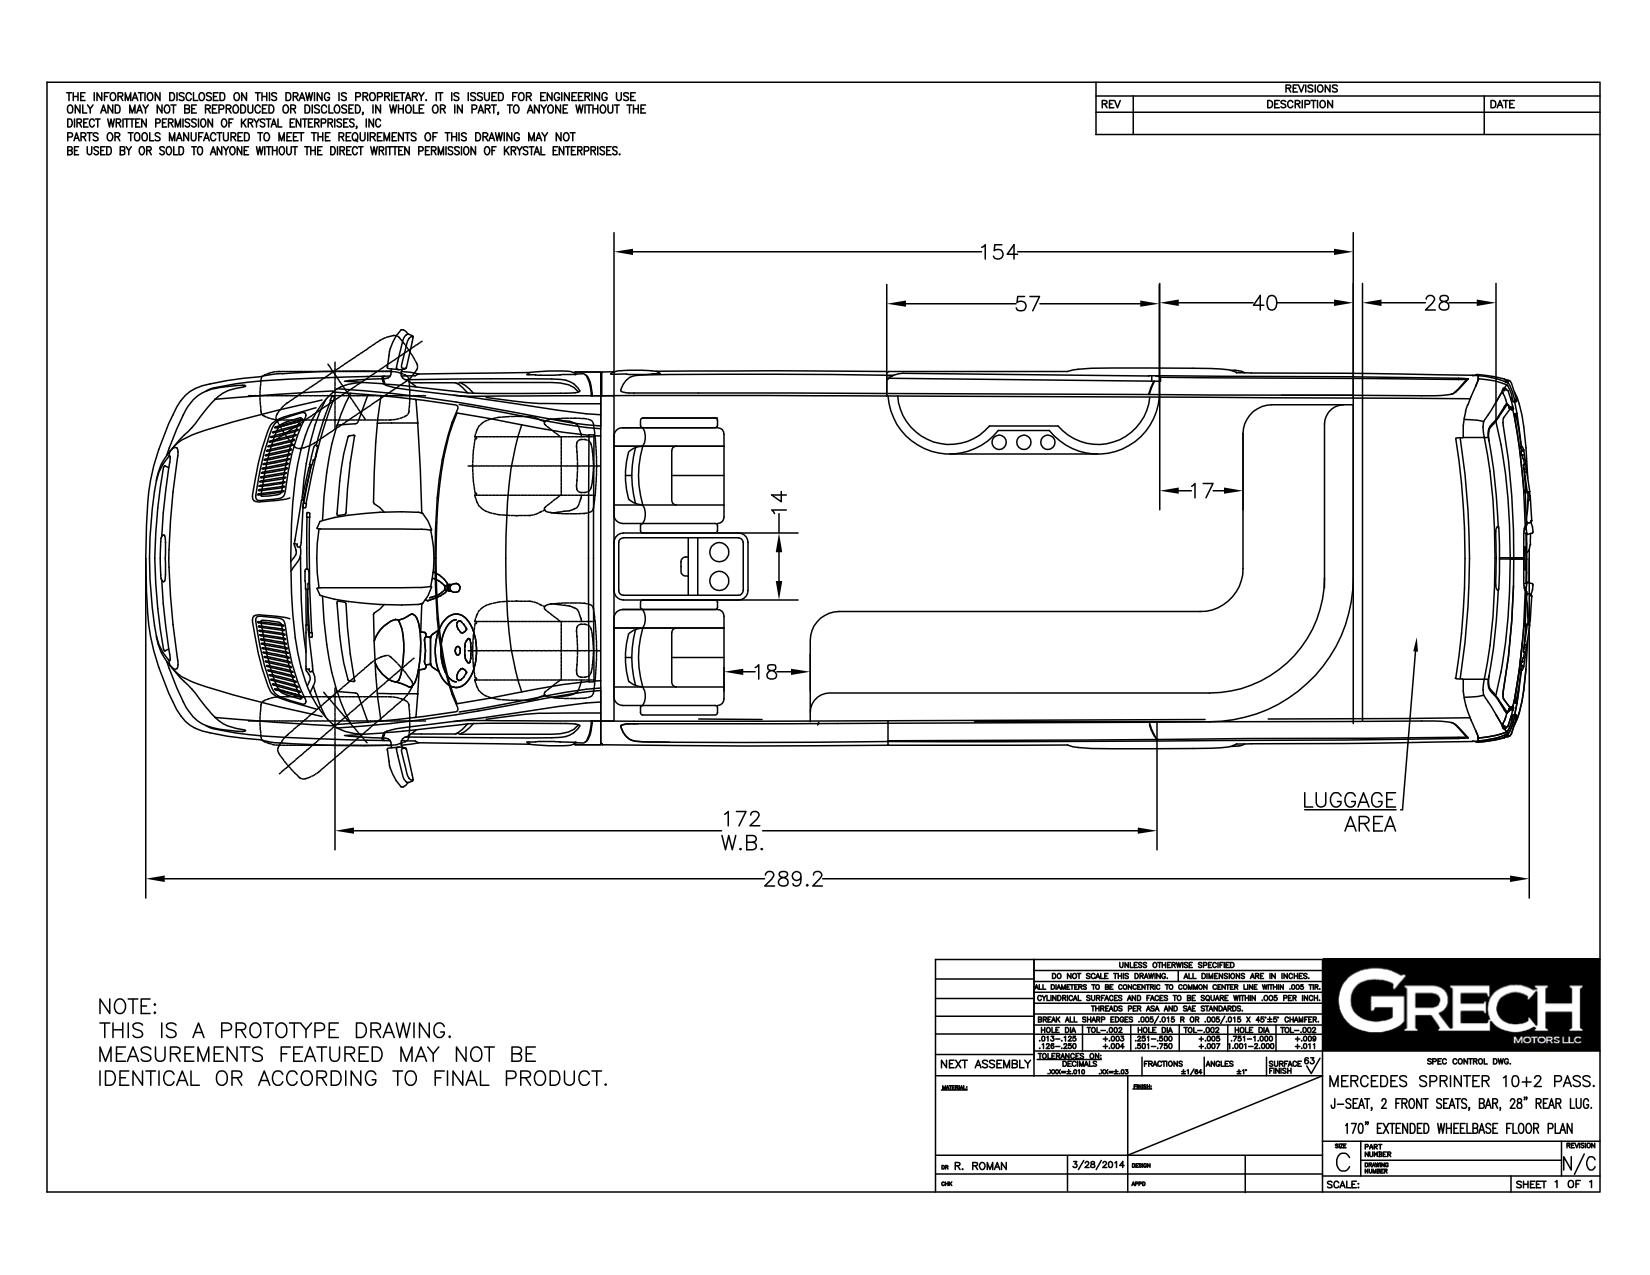 Grech Motors Sprinter Limo floor plan